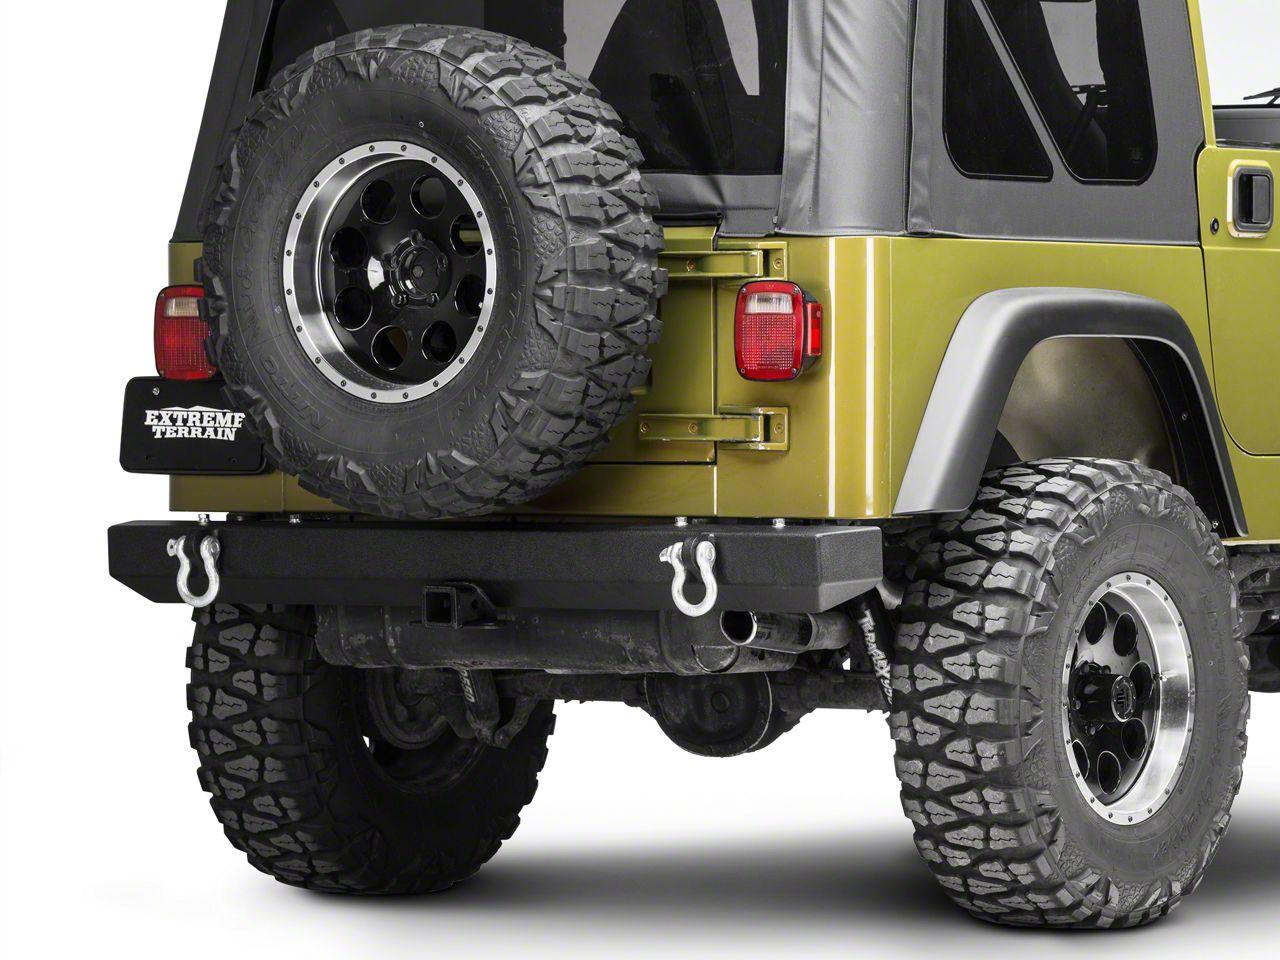 Barricade Classic Rear Bumper (87-06 Jeep Wrangler YJ/TJ)